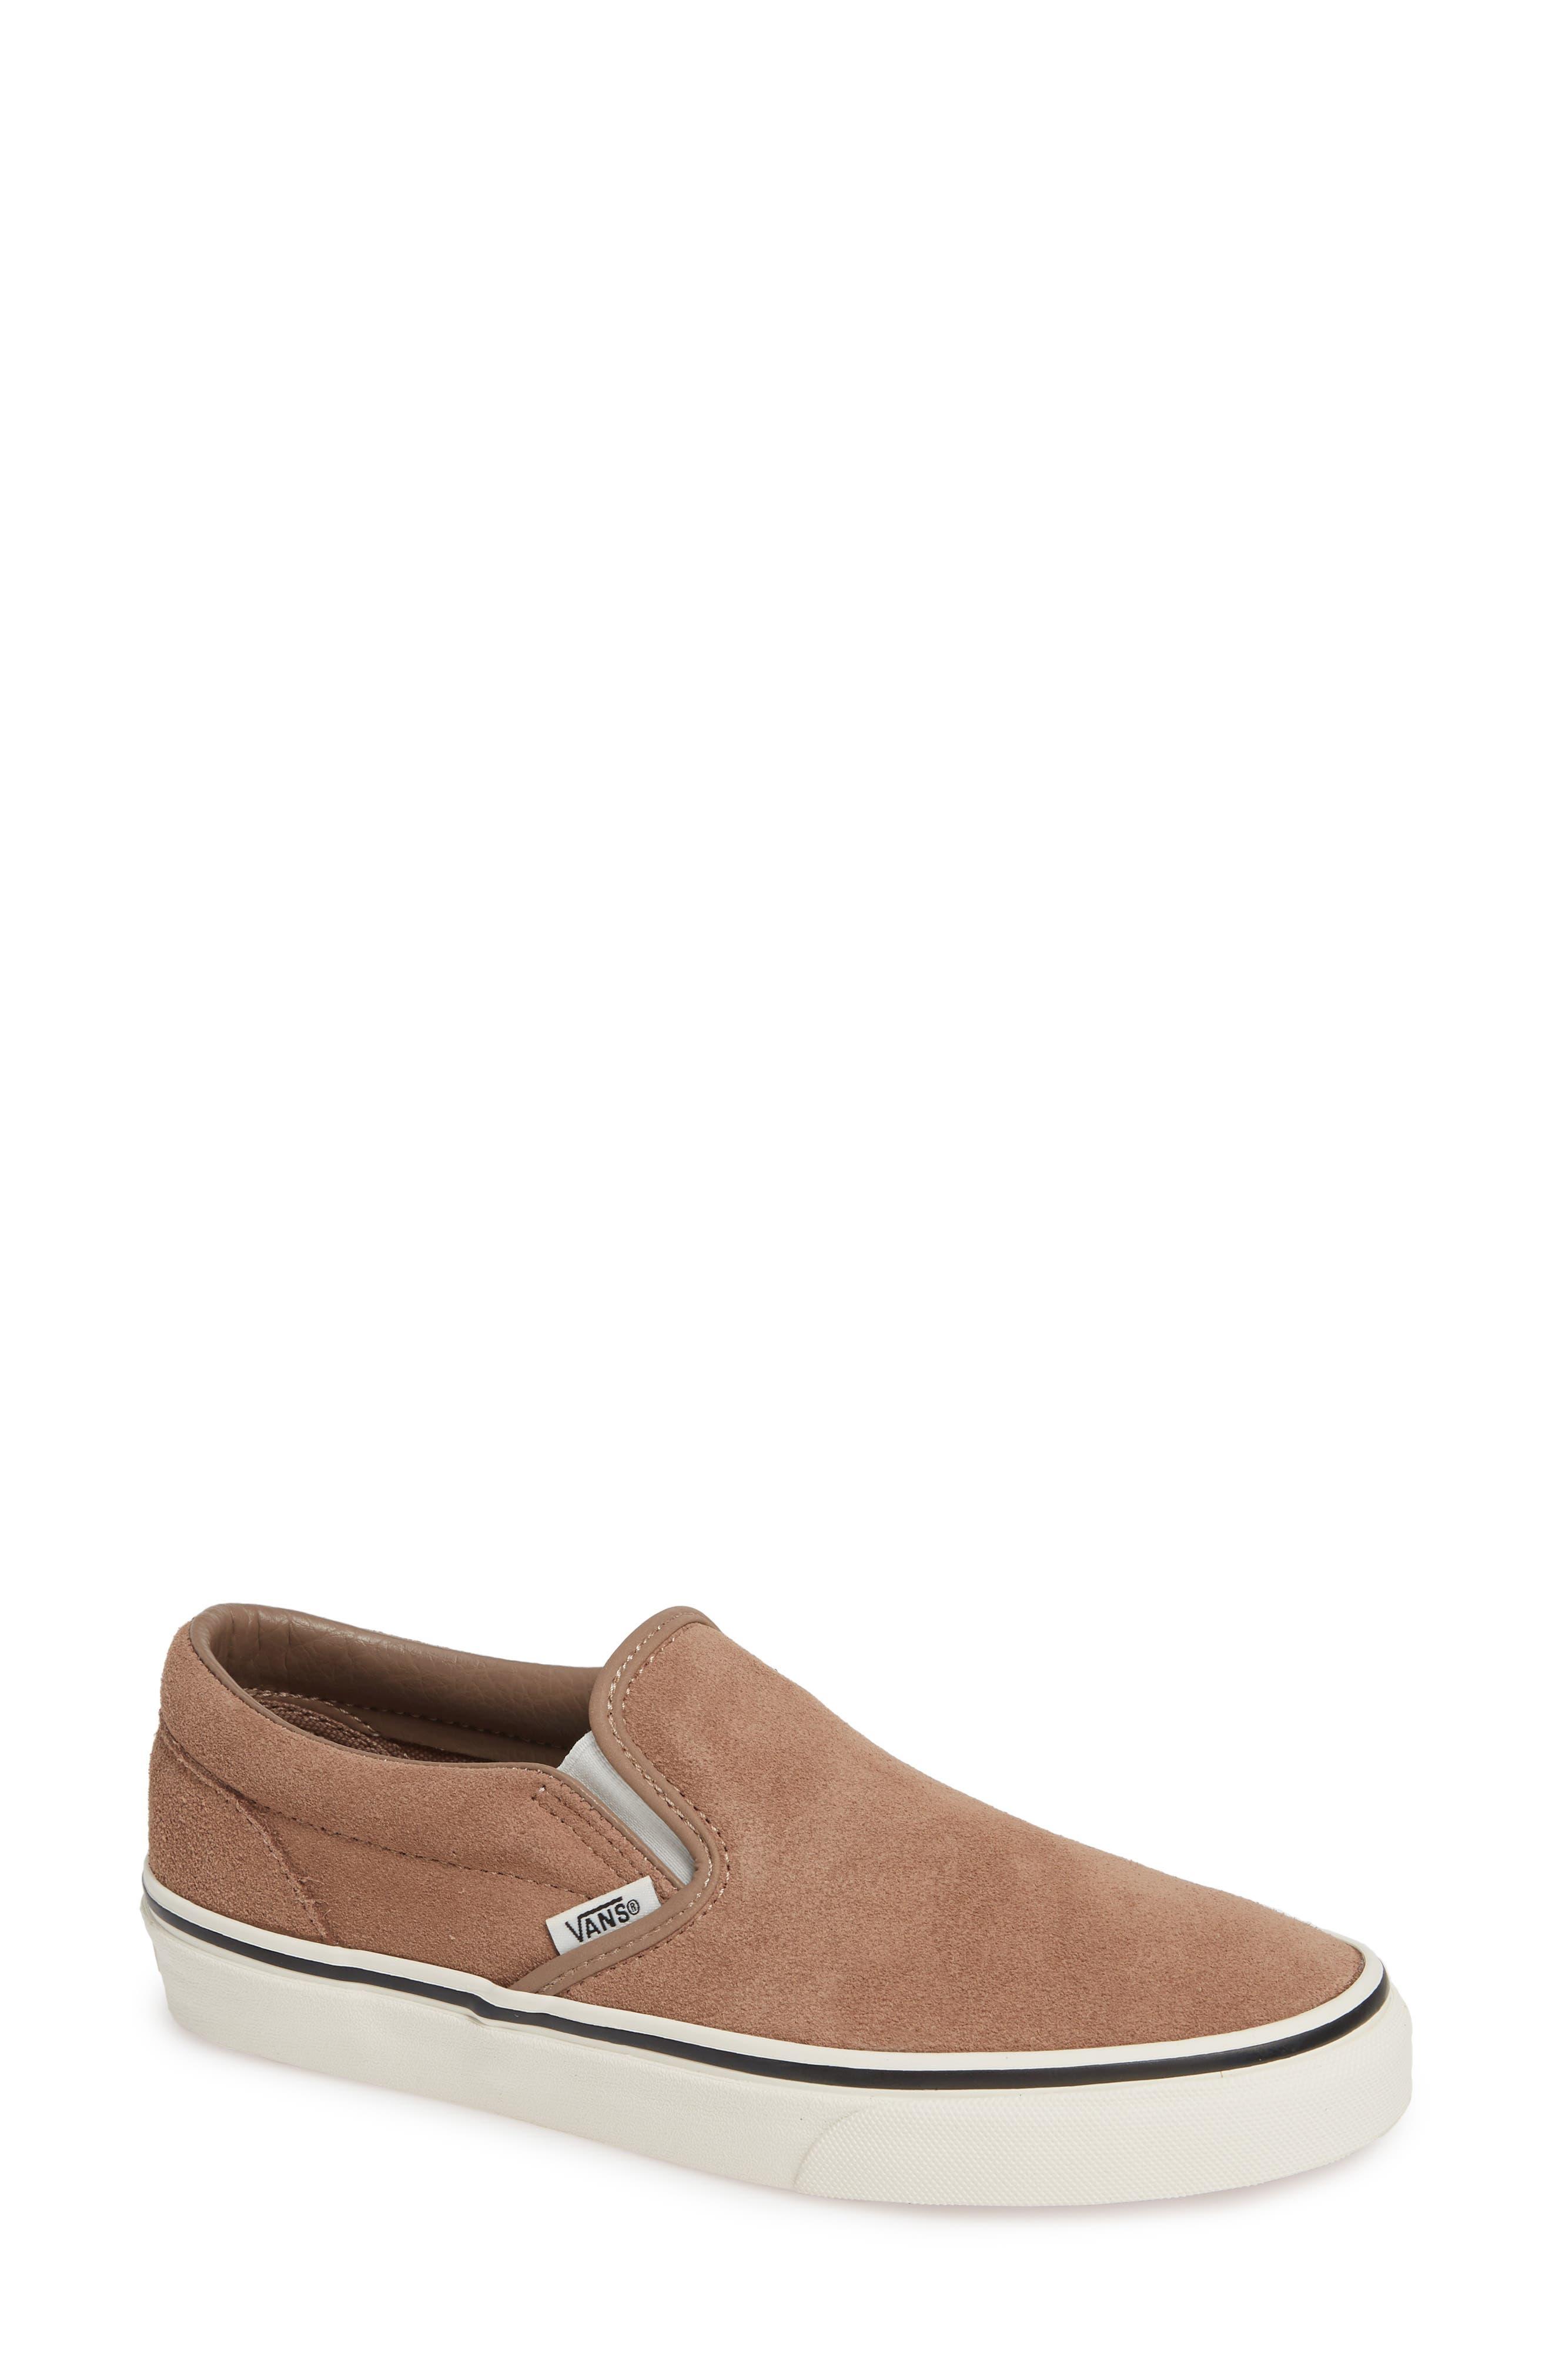 ,                             Classic Slip-On Sneaker,                             Main thumbnail 25, color,                             212